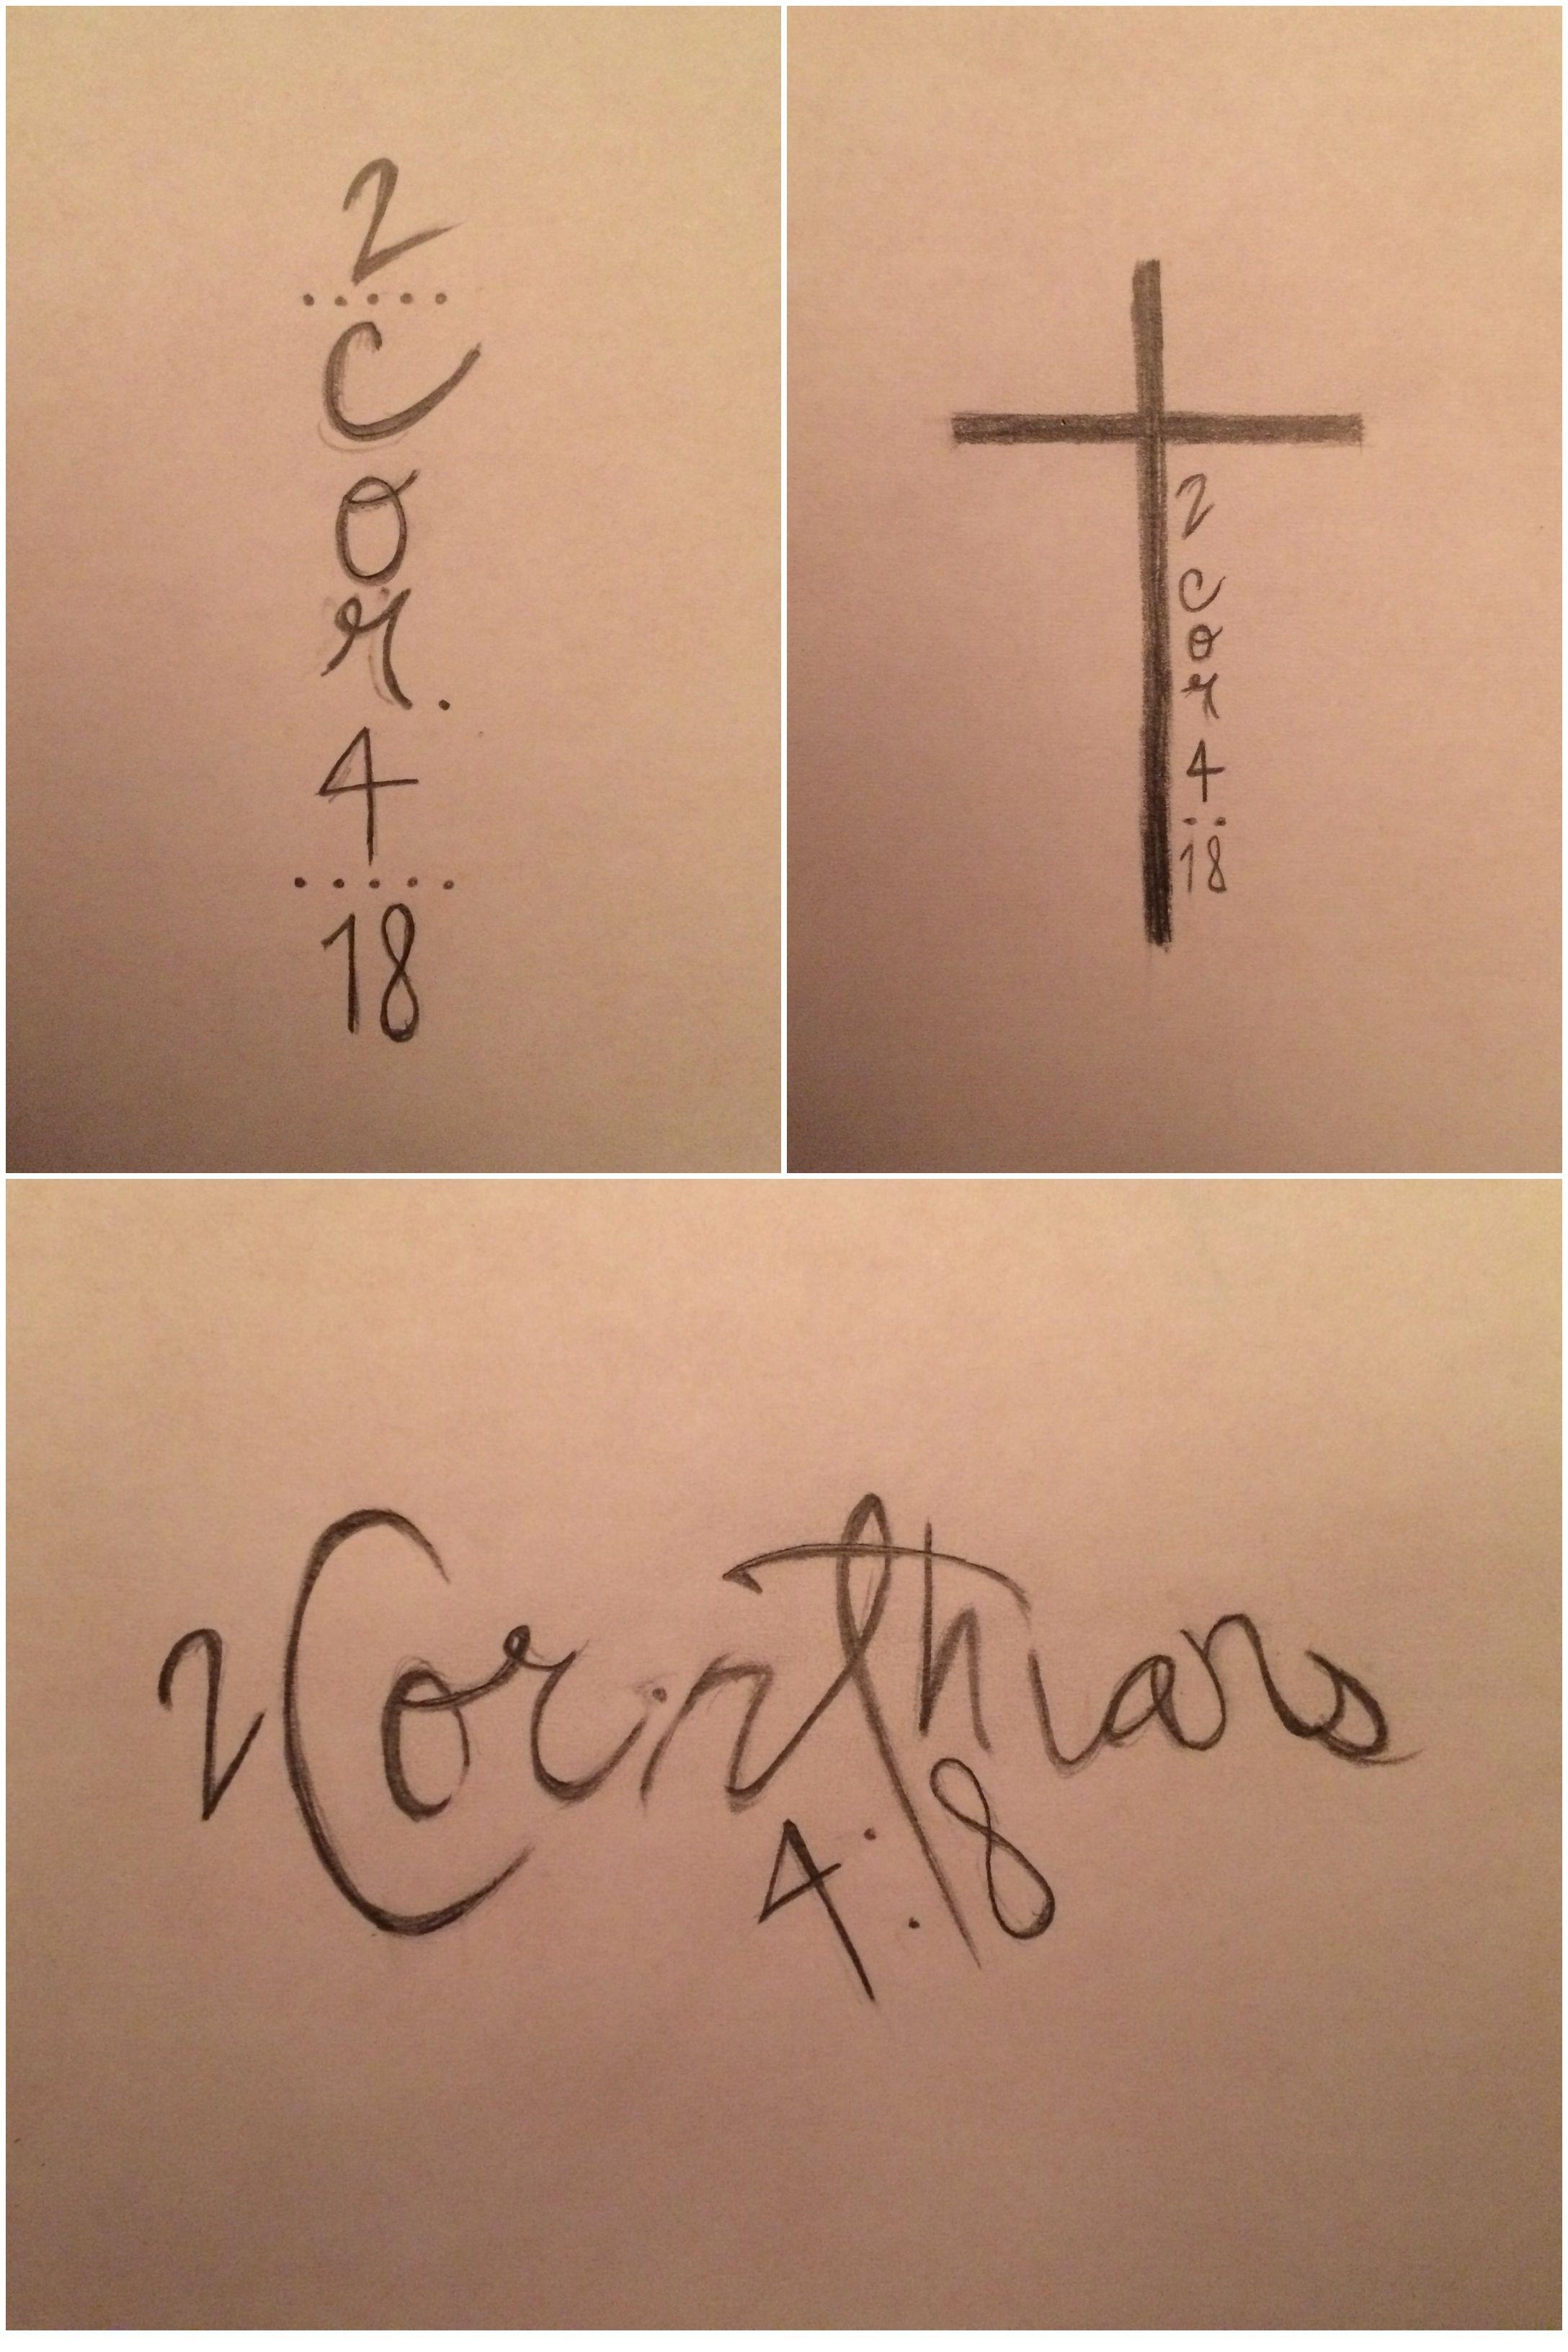 Small cross tattoo ideas for men  corinthians  cross tattoo design  tattoos  pinterest